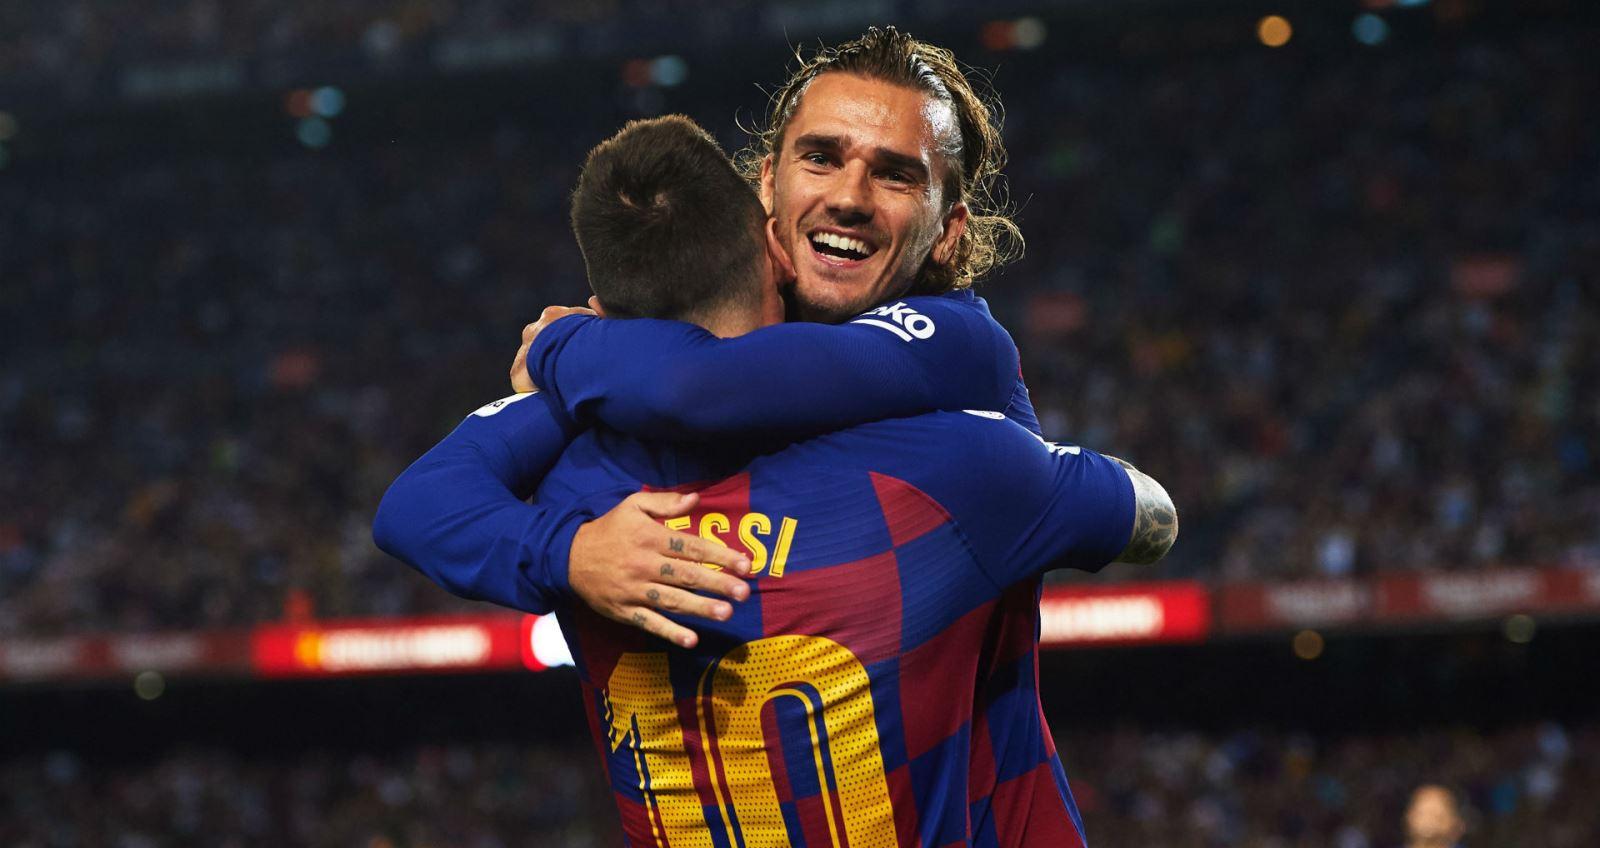 Barcelona. Chuyển nhượng Barcelona. Messi. Griezmann nói về tương lai Messi. Griezmann, Messi rời Barcelona, Messi ở lại barcelona, tương lai Messi, Messi vs Griezman